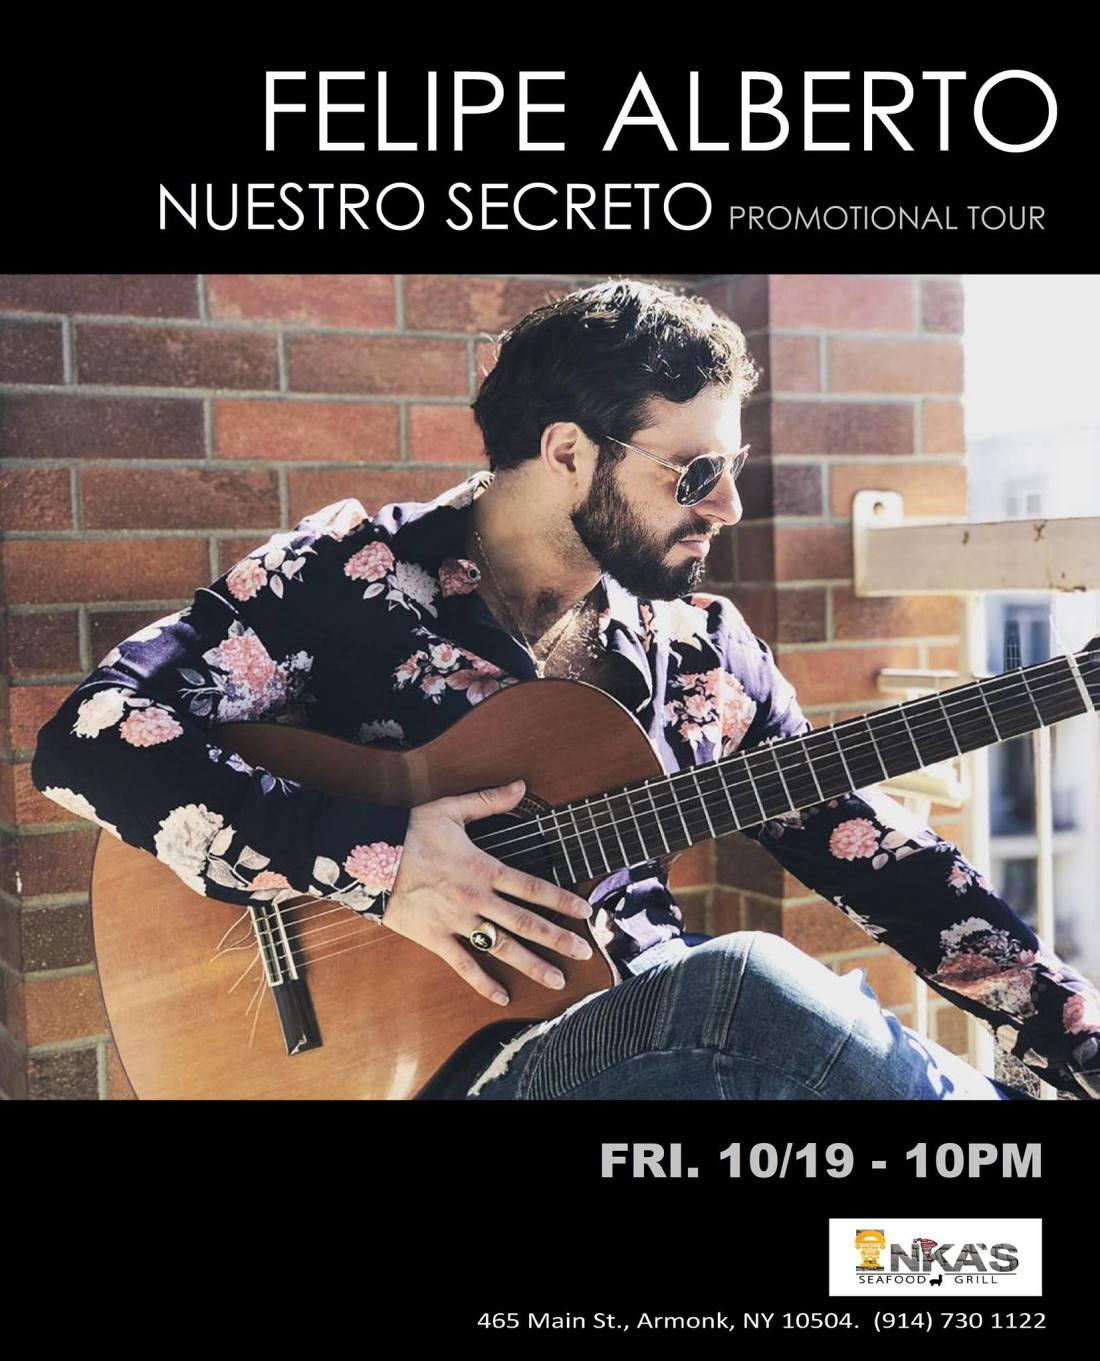 Felipe Alberto - Nuestro Secreto Promotional Tour October 2018